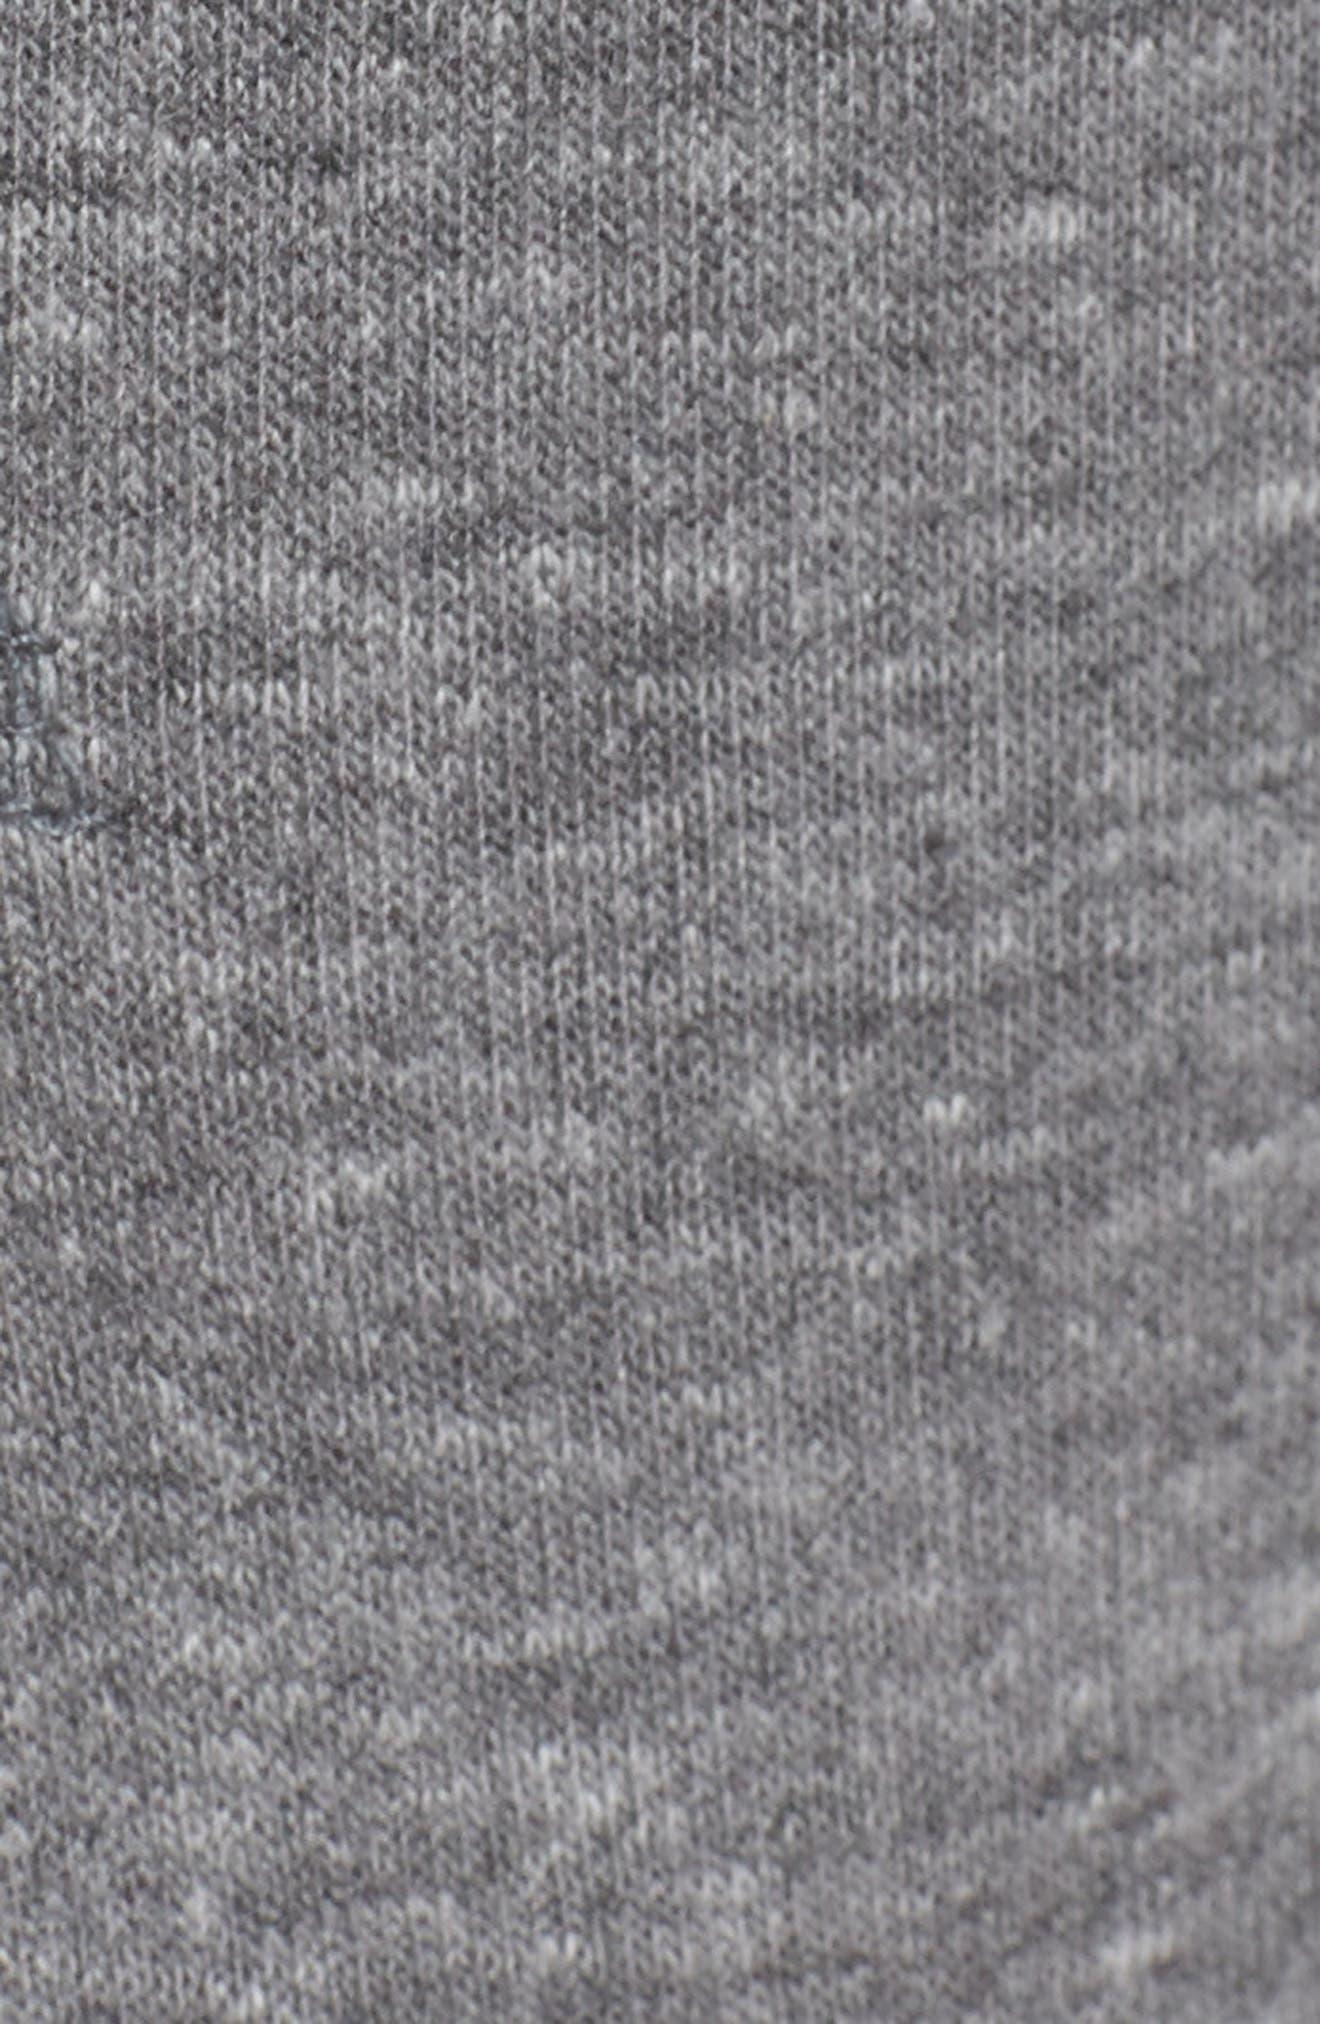 Moto Sweatpants,                             Alternate thumbnail 6, color,                             Heather Grey